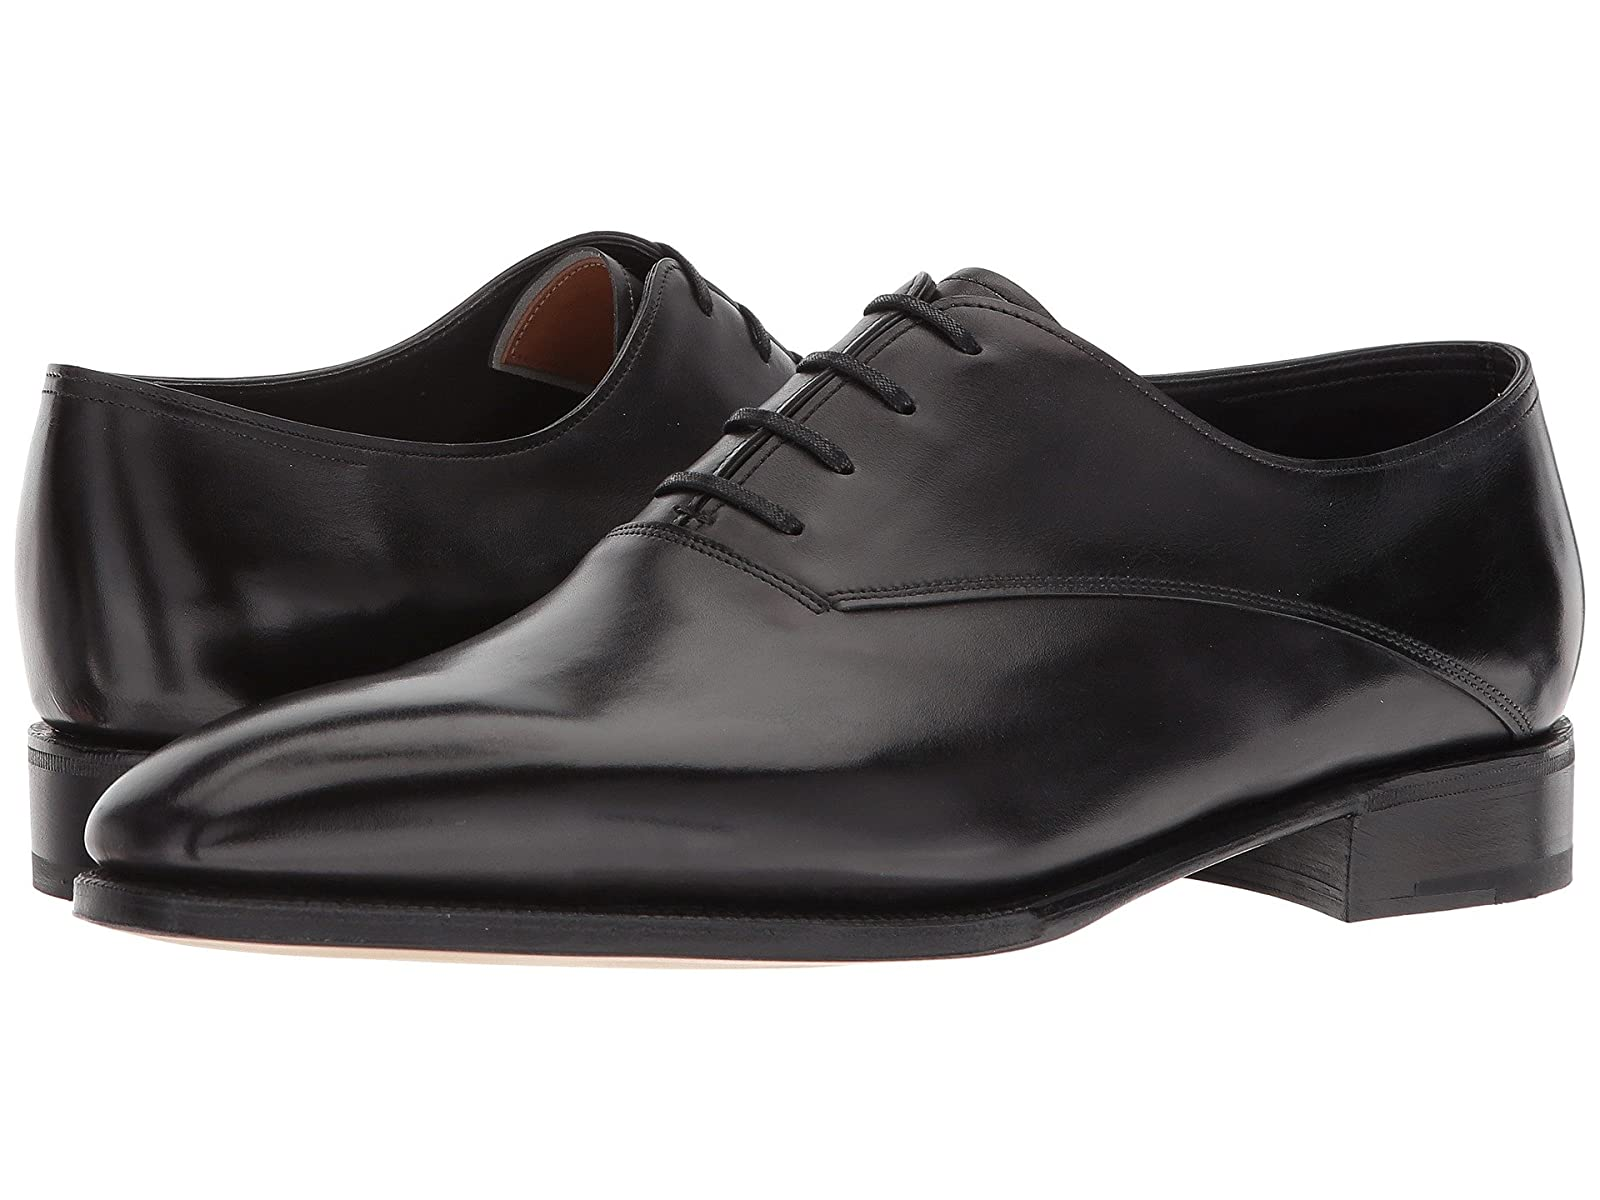 John Lobb Becketts OxfordAtmospheric grades have affordable shoes